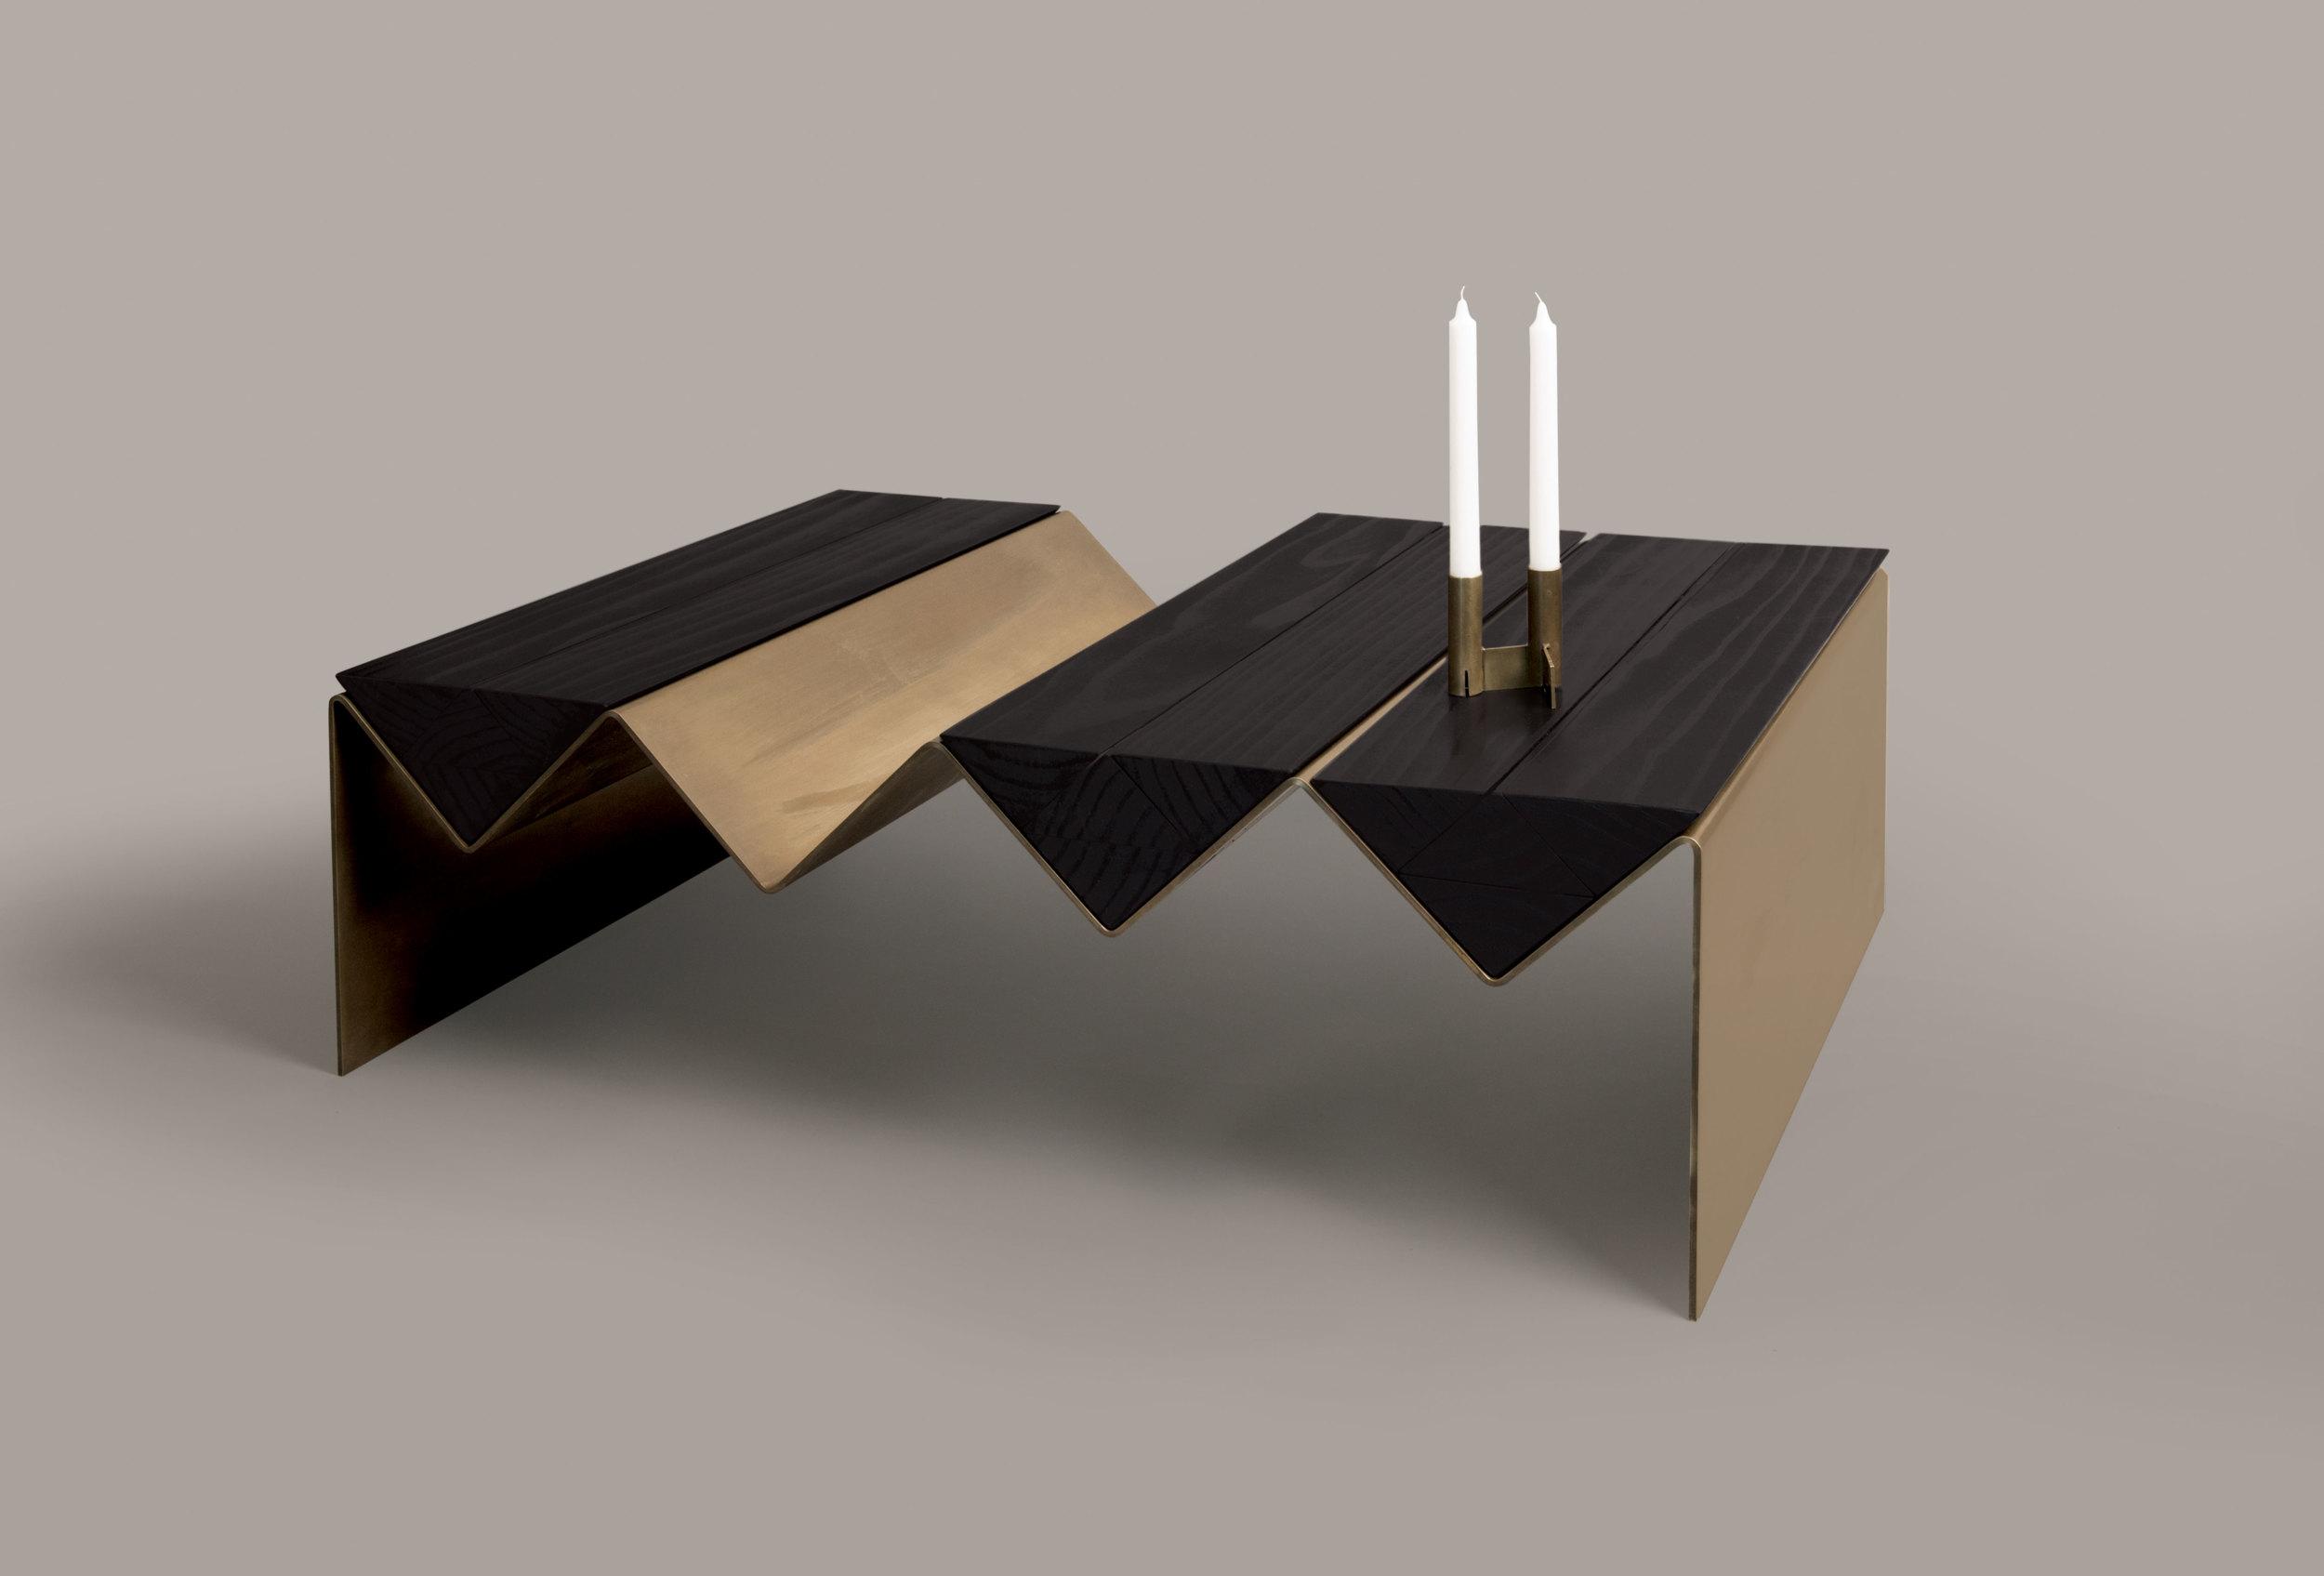 The 'Zig Zag' coffee table and 'Interlock' candlesticks.